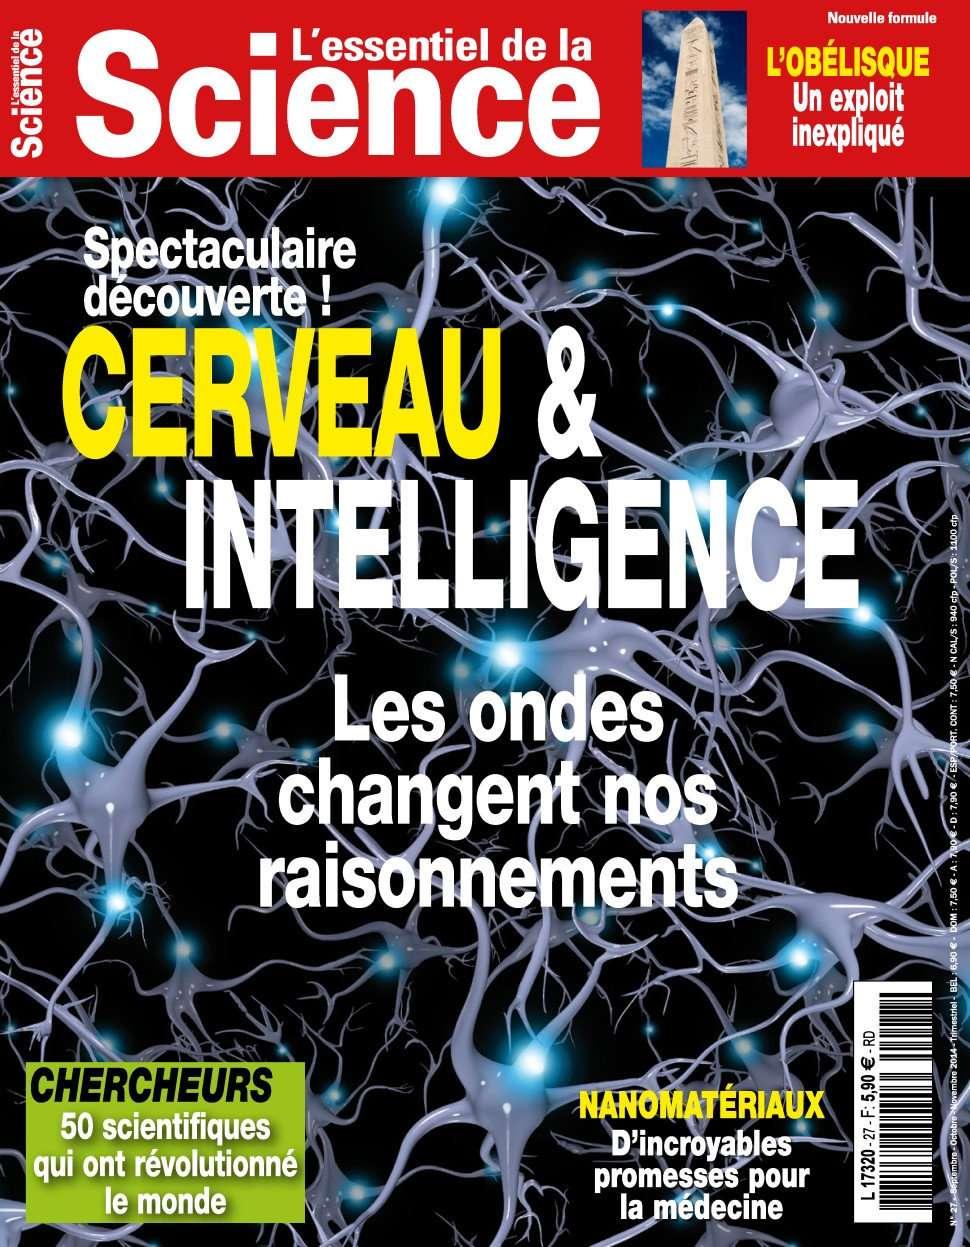 L'Essentiel de la science 27 - Cerveau & Intelligence